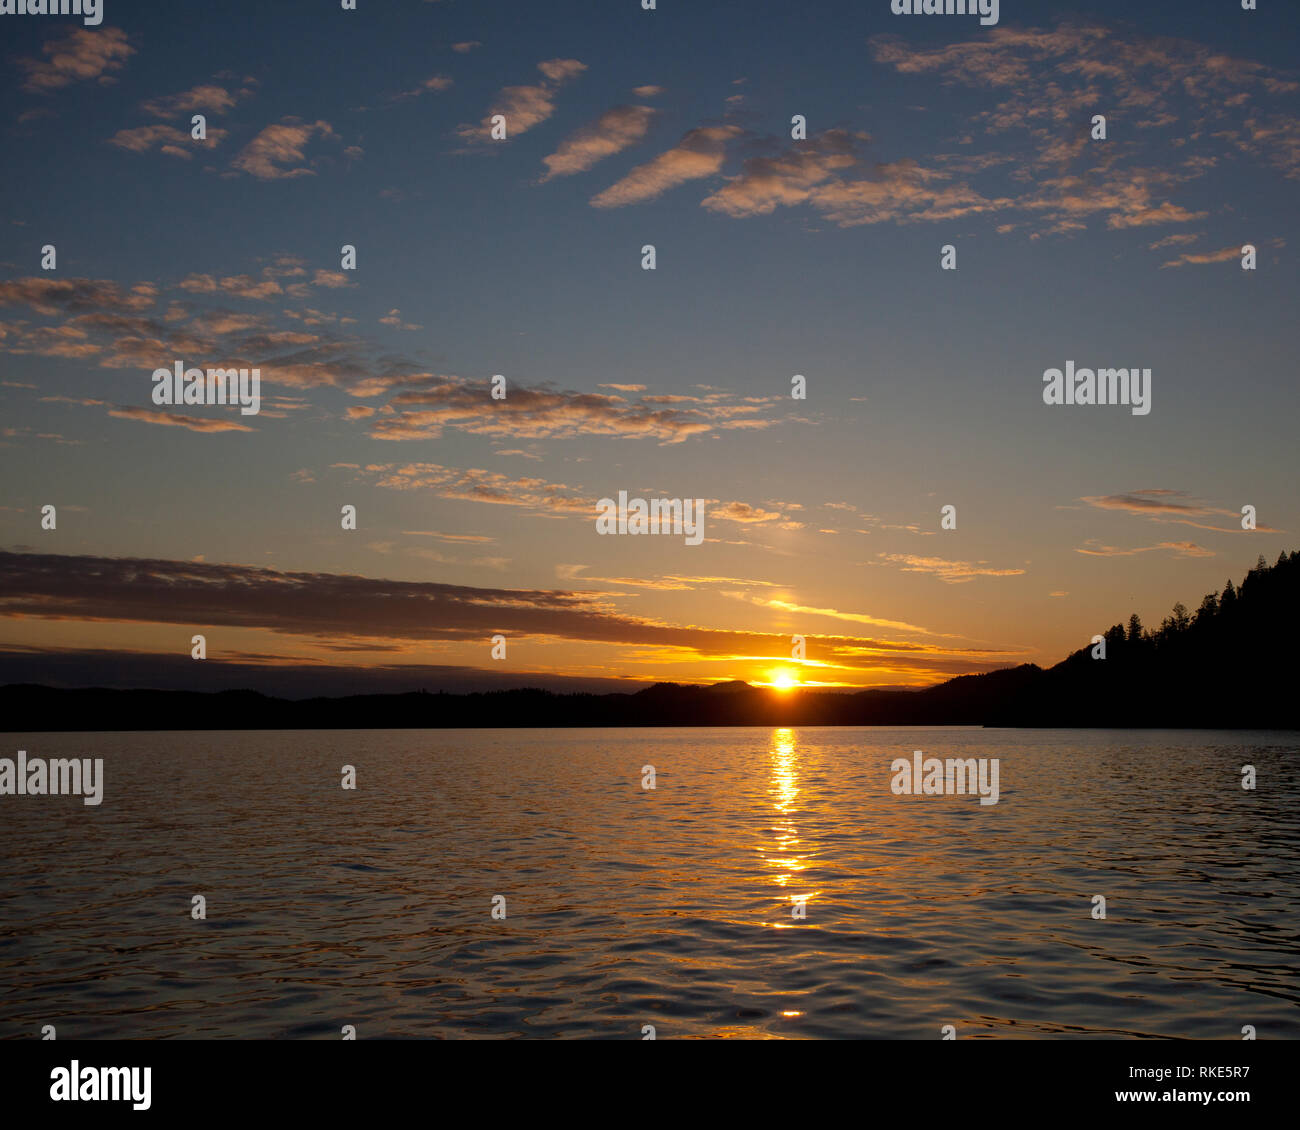 Desolation Sound, Desolation Sound, British Columbia, Canada - Stock Image